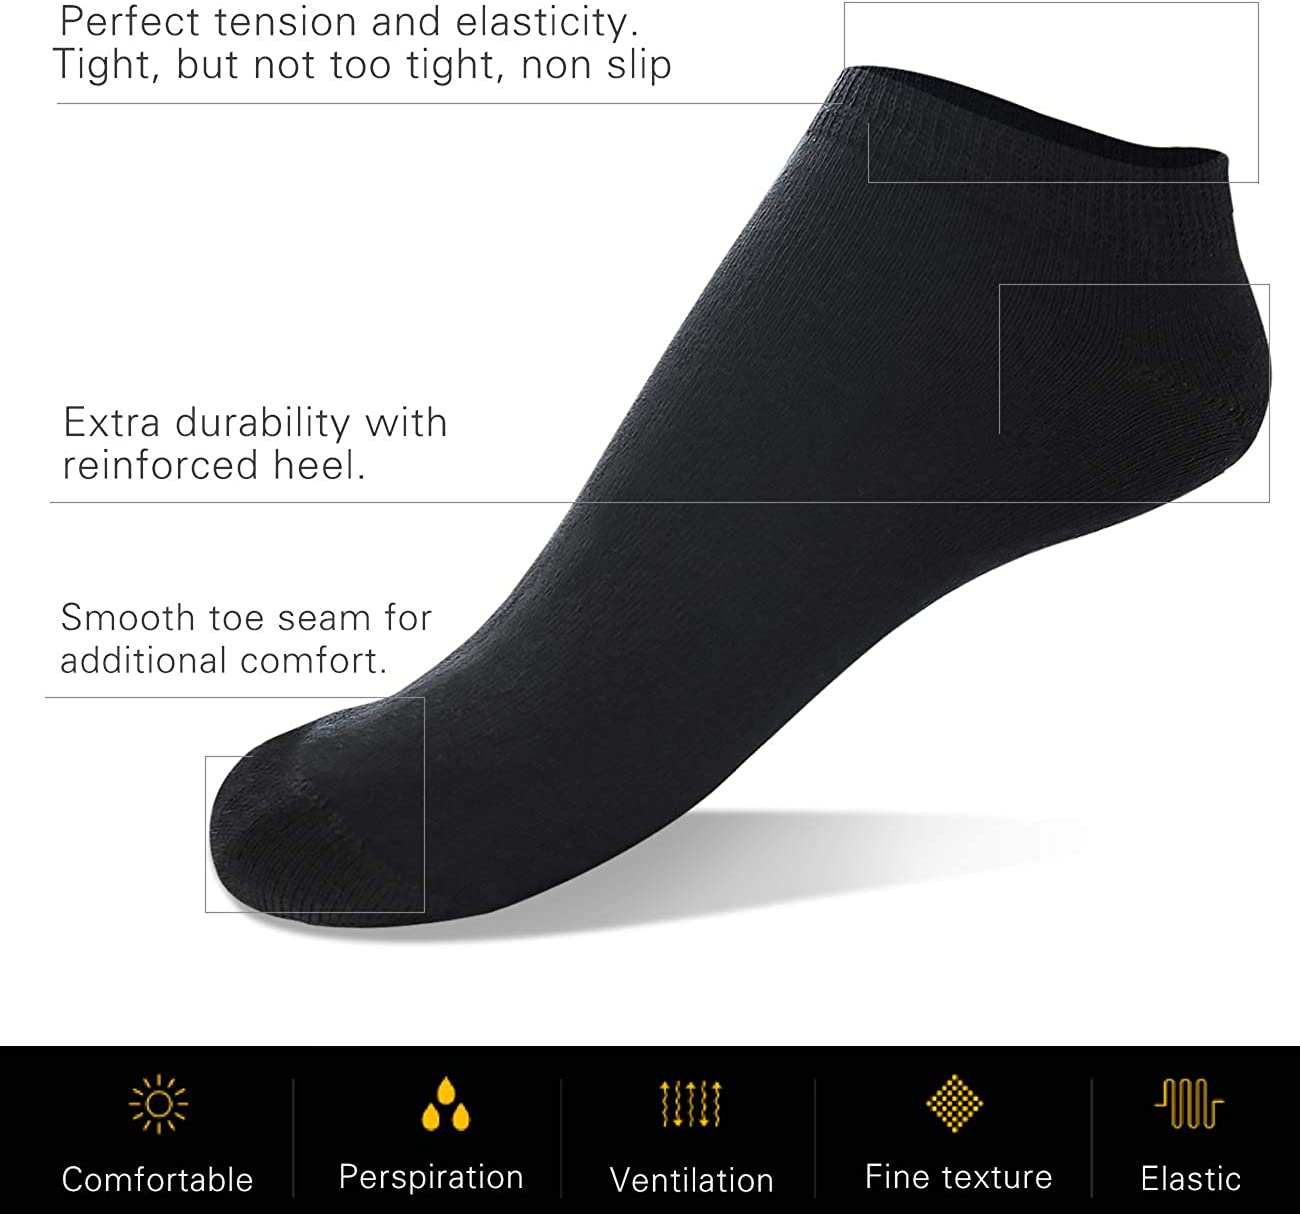 Cotton Trainer Socks for Men and Women CALZE YTLI 6 Pairs Sports Socks